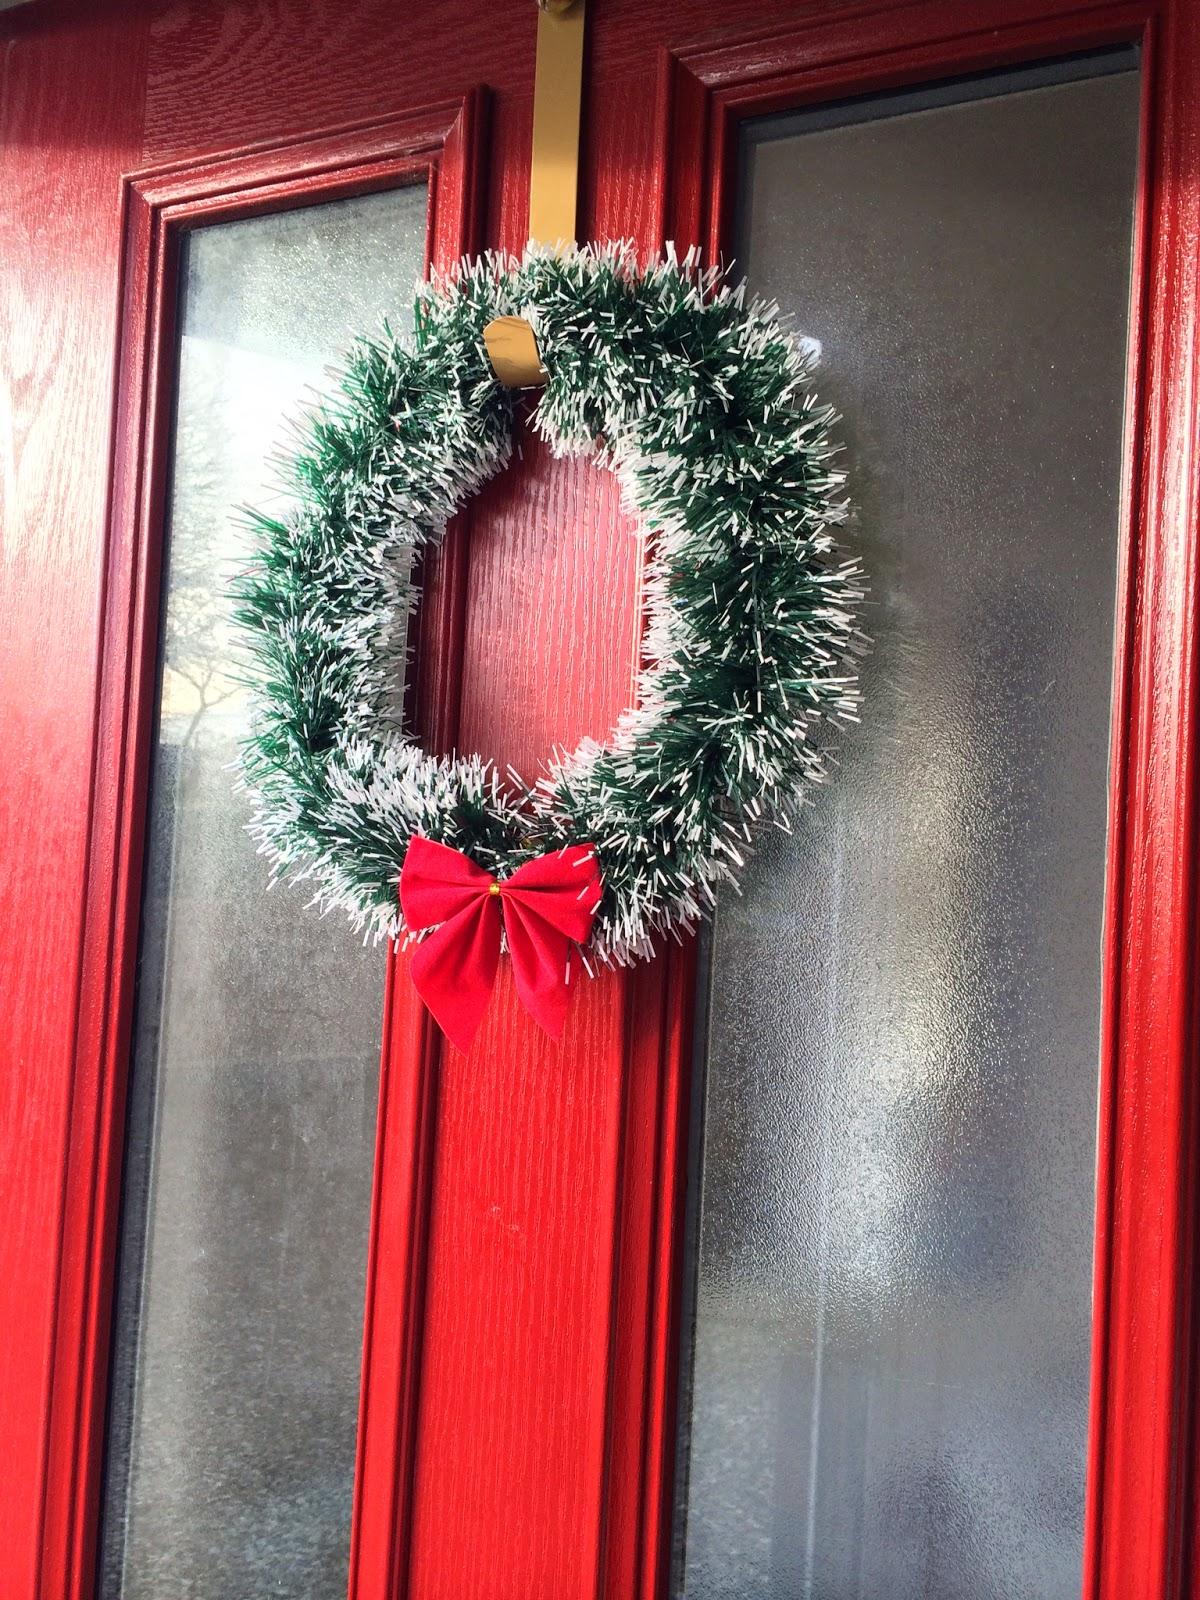 Christmas Decorations Poundland : Countryheartandhome have yourself a poundland christmas